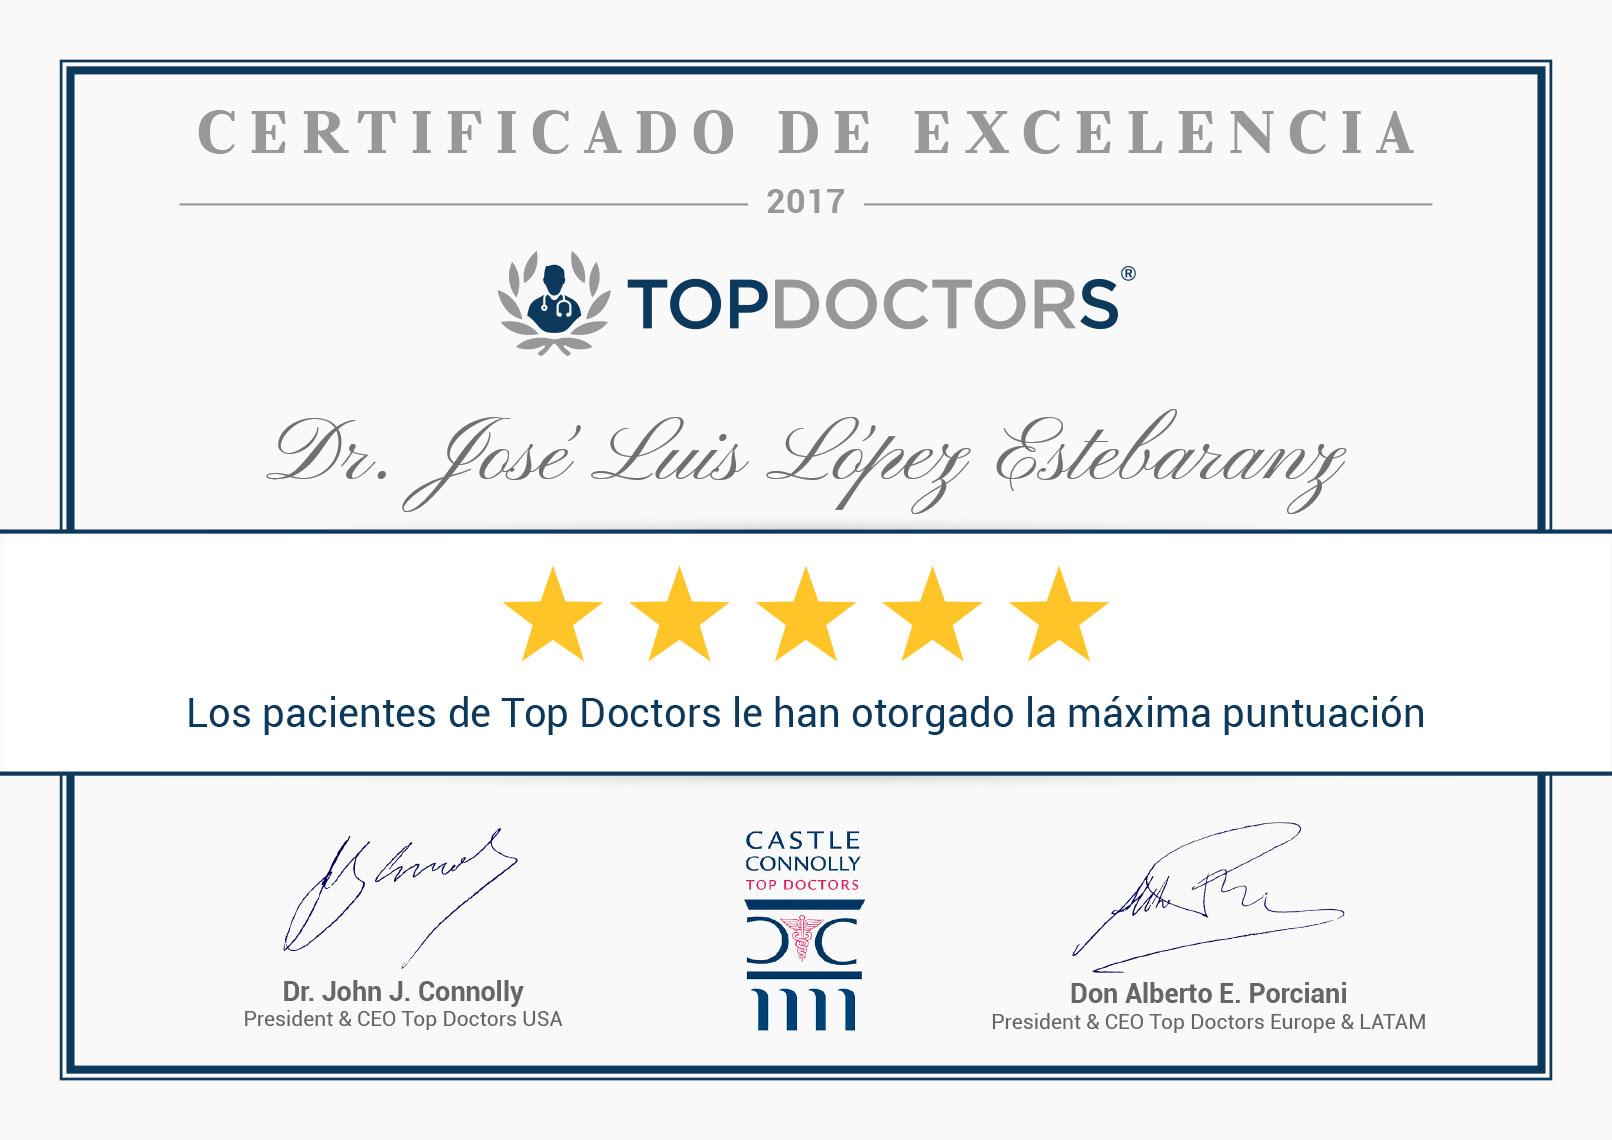 certificado excelencia topdotors 2017 dr lopez estebaranz